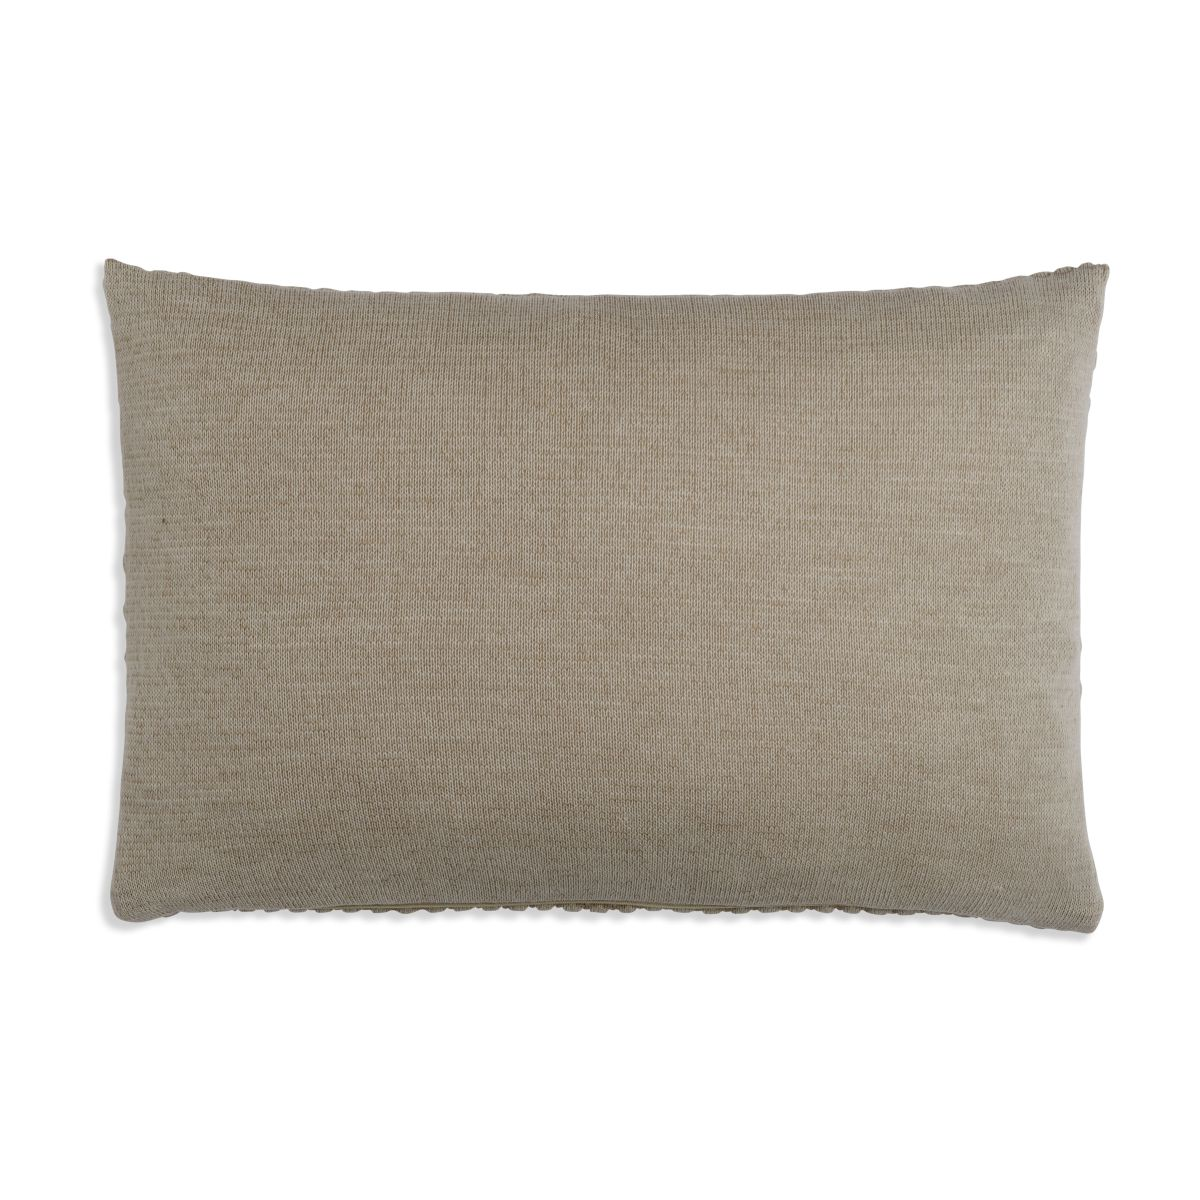 juul cushion sedaolive 60x40